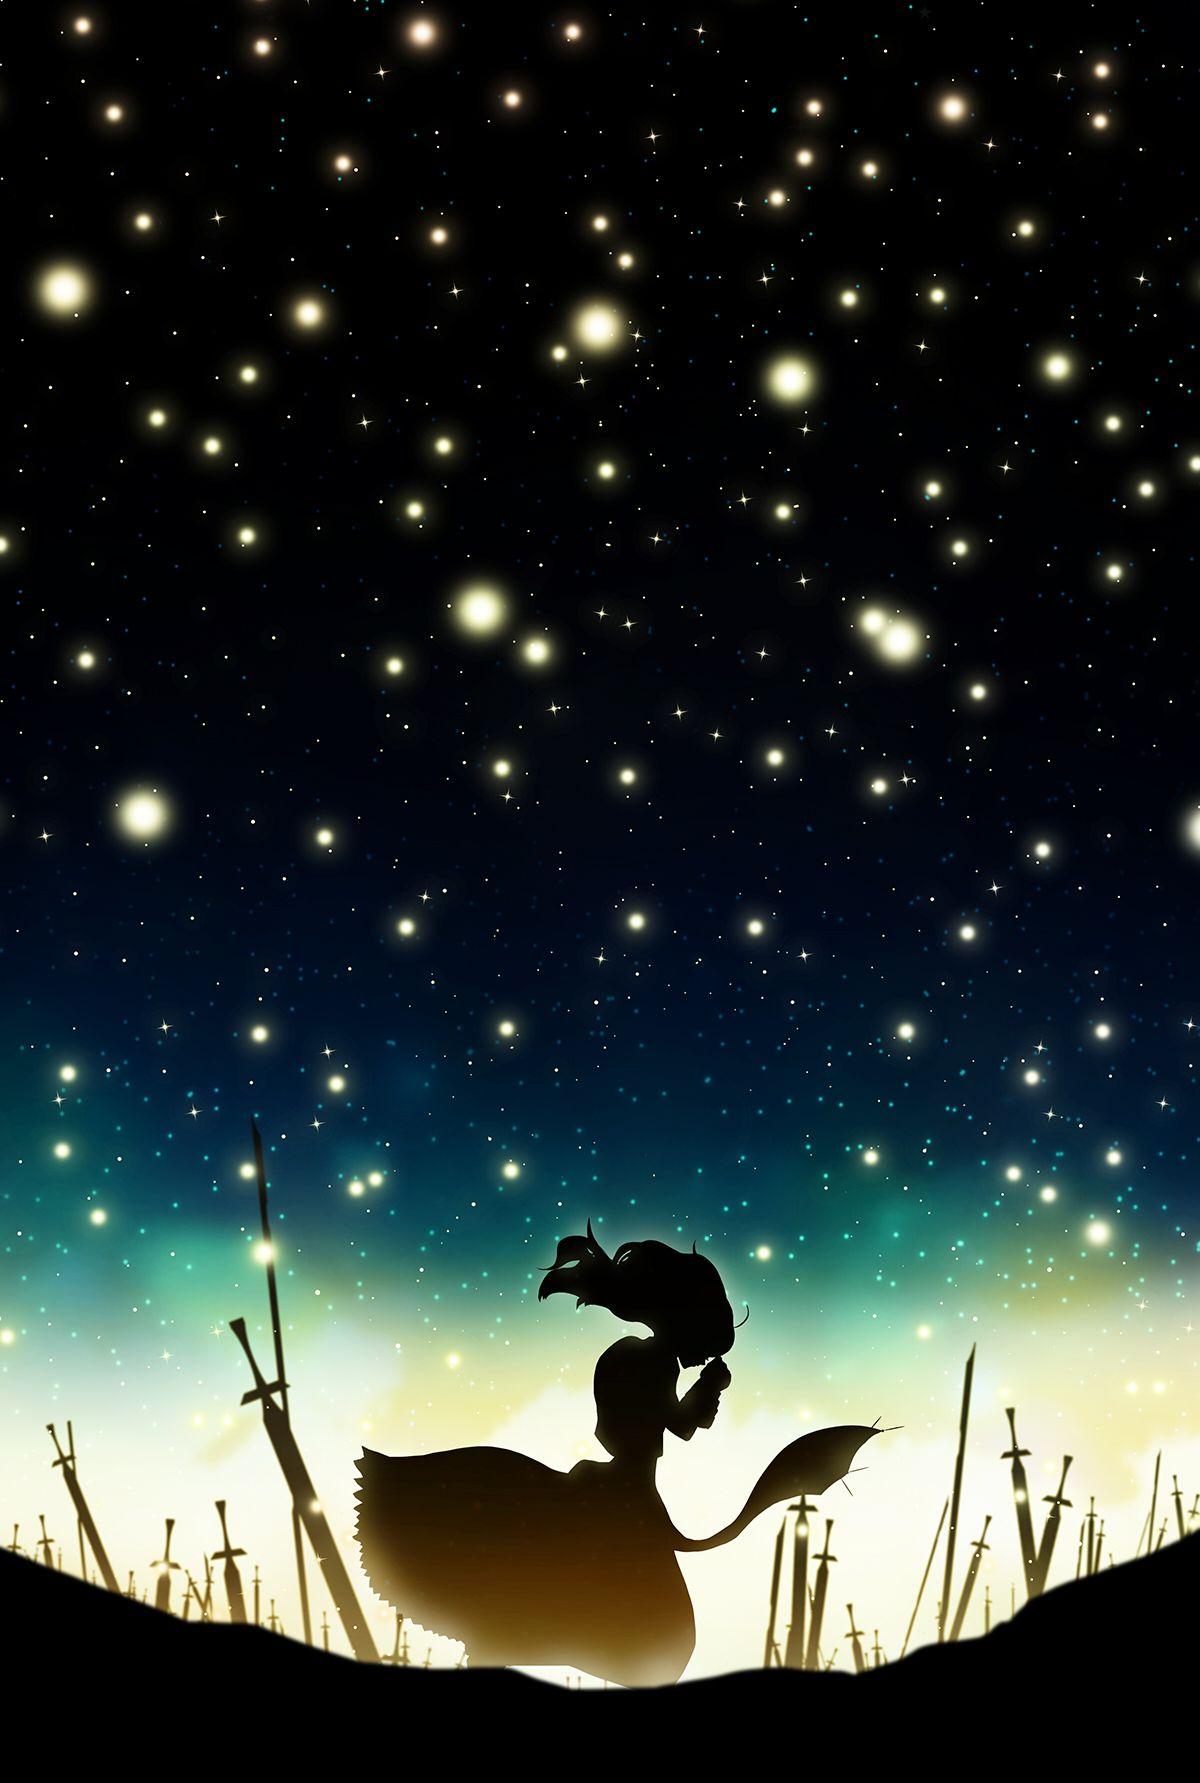 Fate Stay Night Saber By Harada Miyuki アニメの風景 セイバー